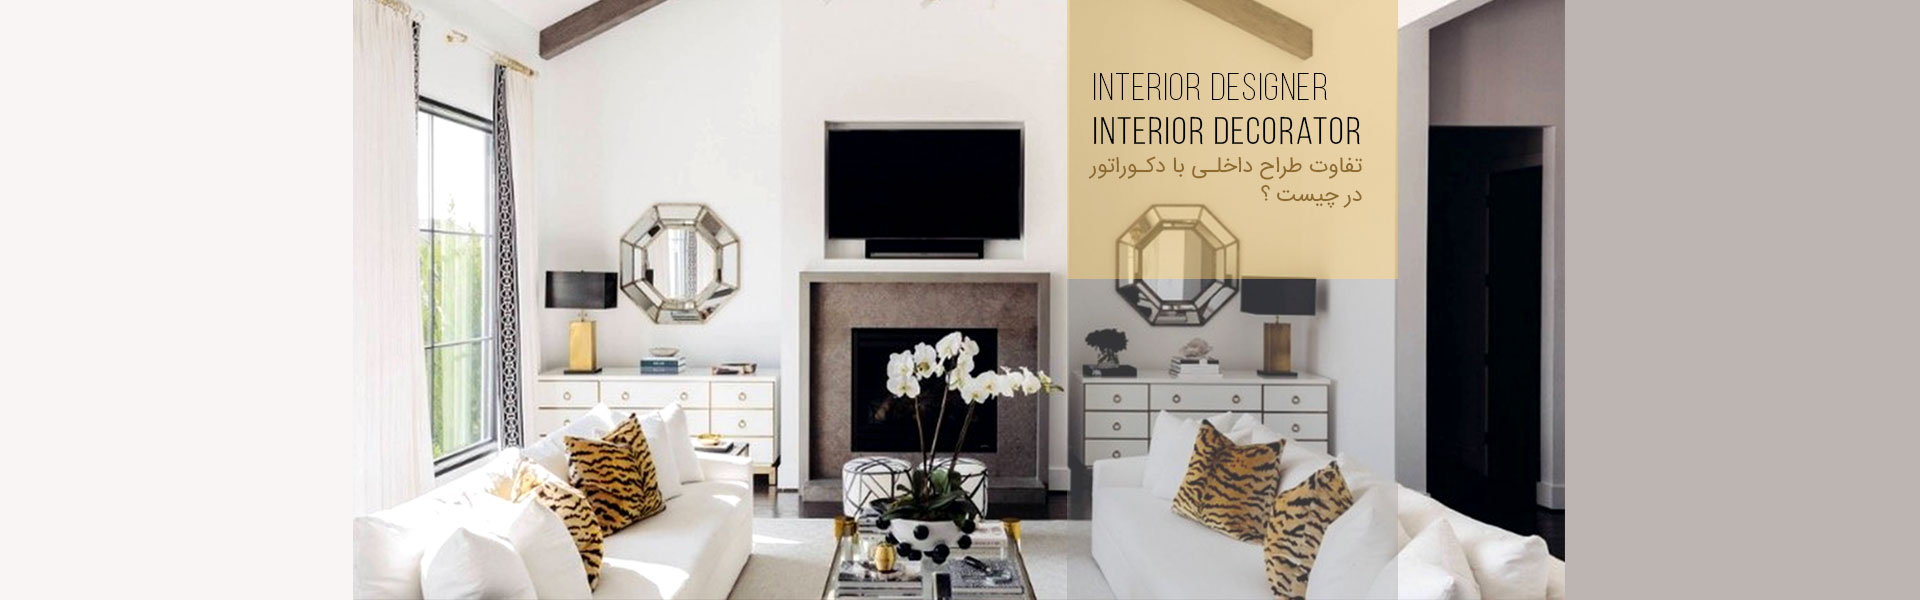 decorasion decorator tarahe dakheli1 - تفاوت طراح داخلی با دکوراتور در چیست ؟